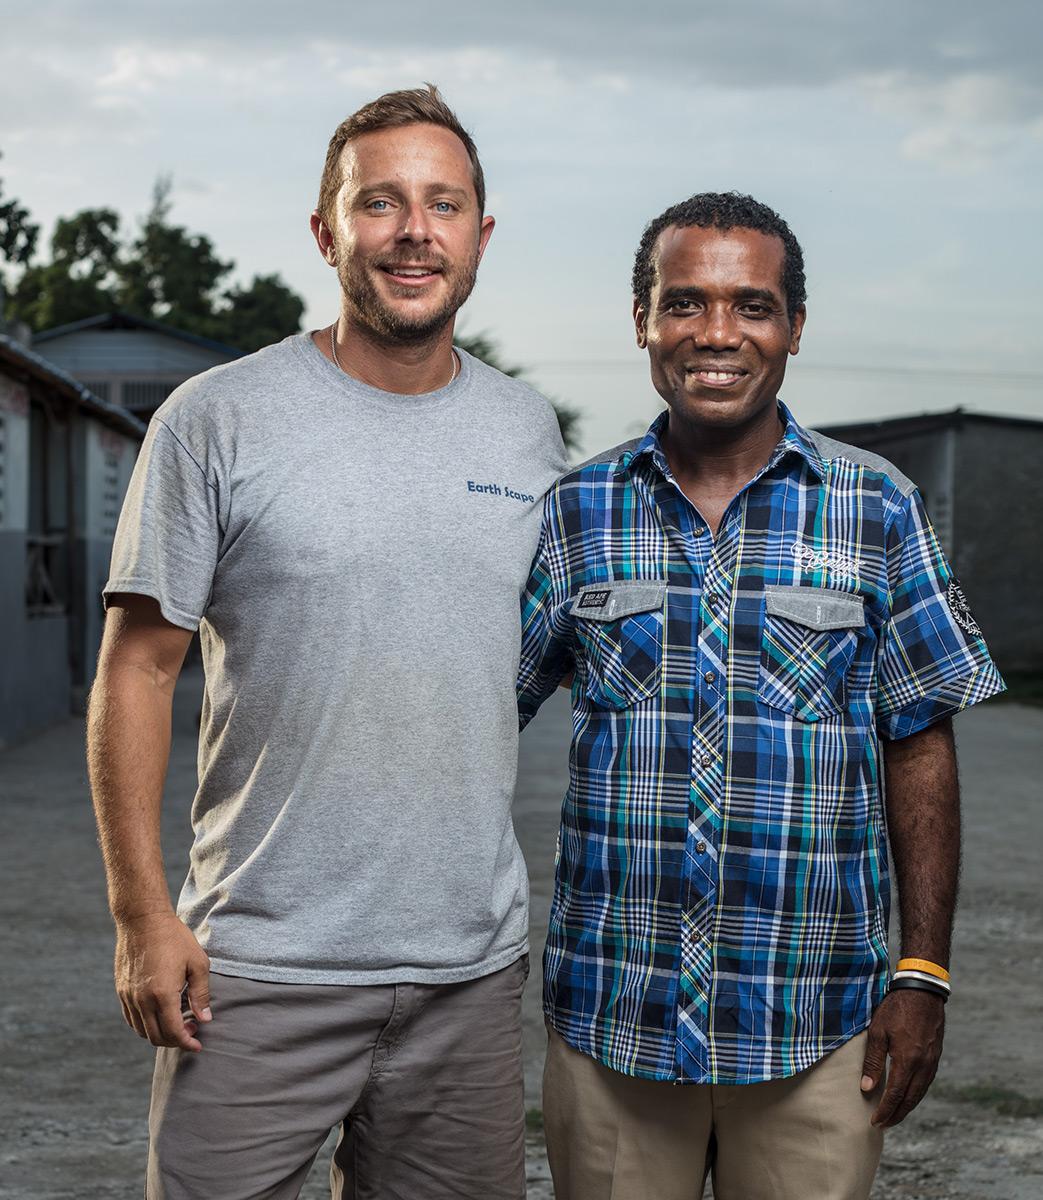 Pastor Stuart West (left) & Pastor Kelly Fleury (right)